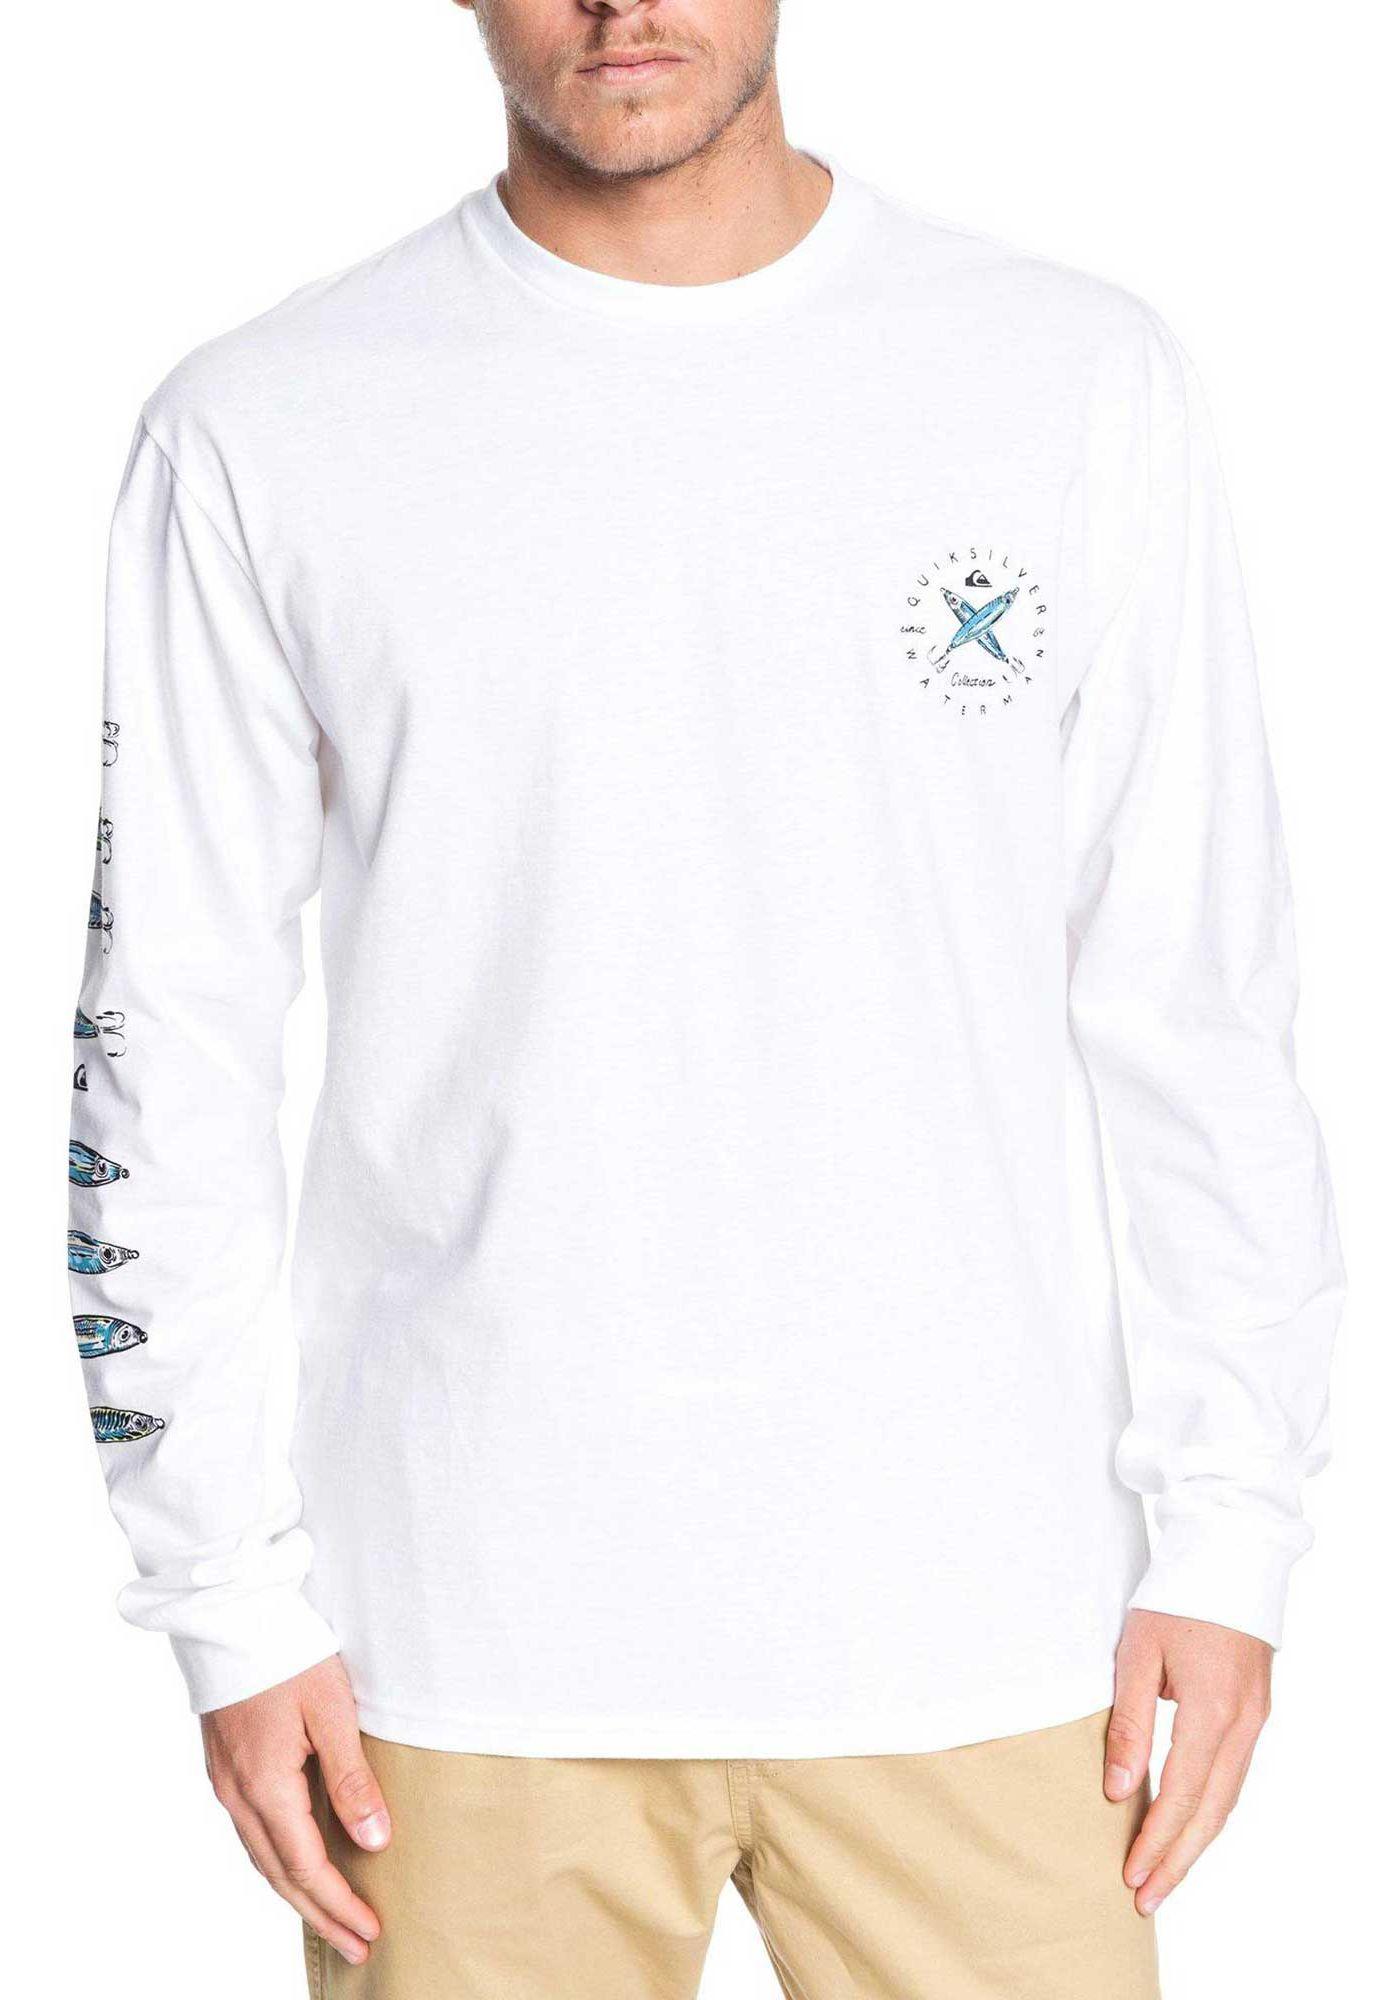 Quiksilver Men's Lure Me In Long Sleeve T-Shirt